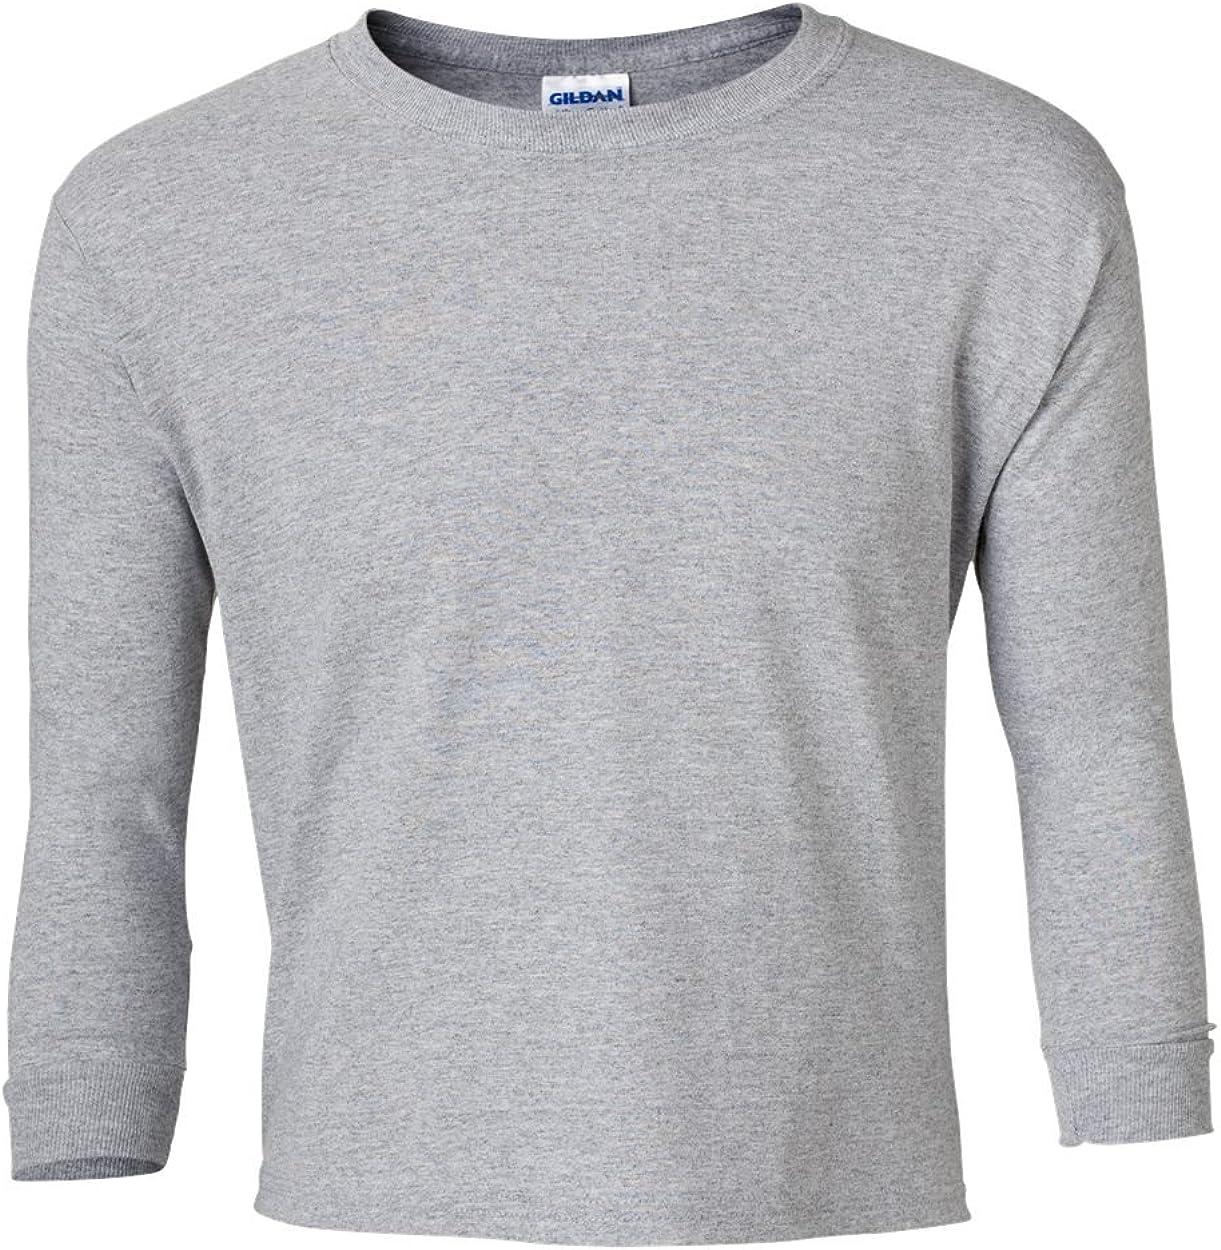 Gildan Ultra Cotton Youth 6 oz. Long-Sleeve T-Shirt (G240B) SPORT GREY